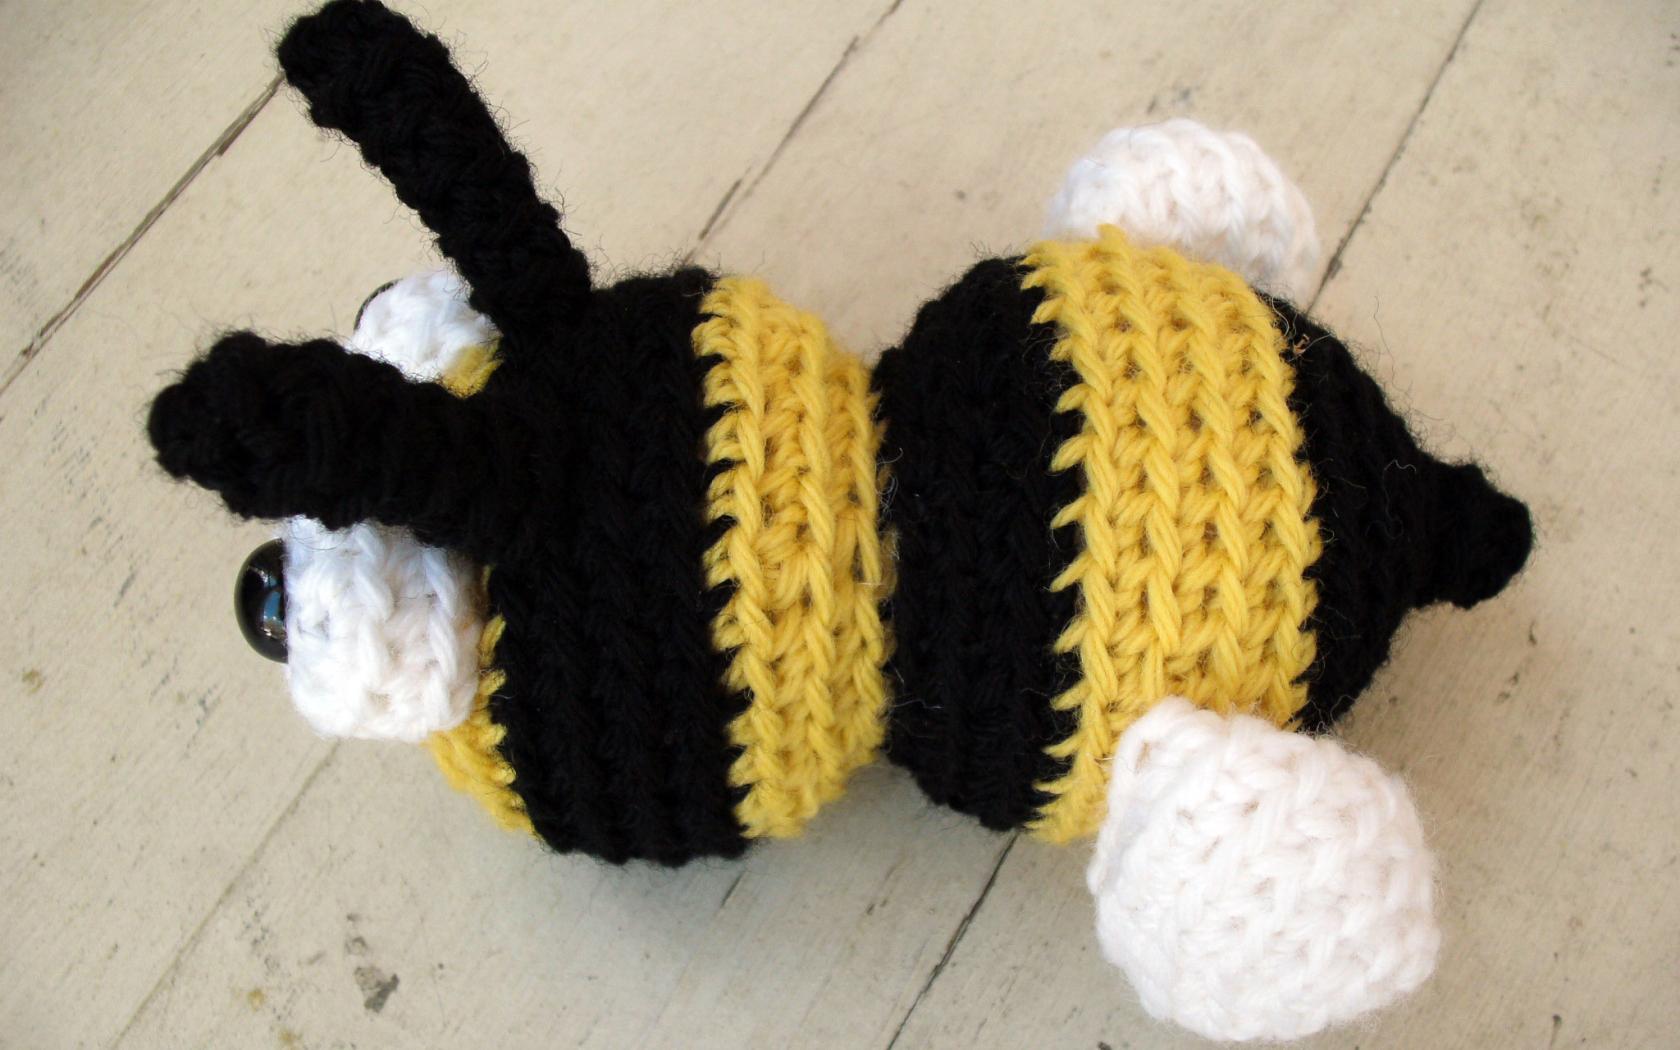 Soft & Dreamy Bee amigurumi pattern - Amigurumi Today | 1050x1680